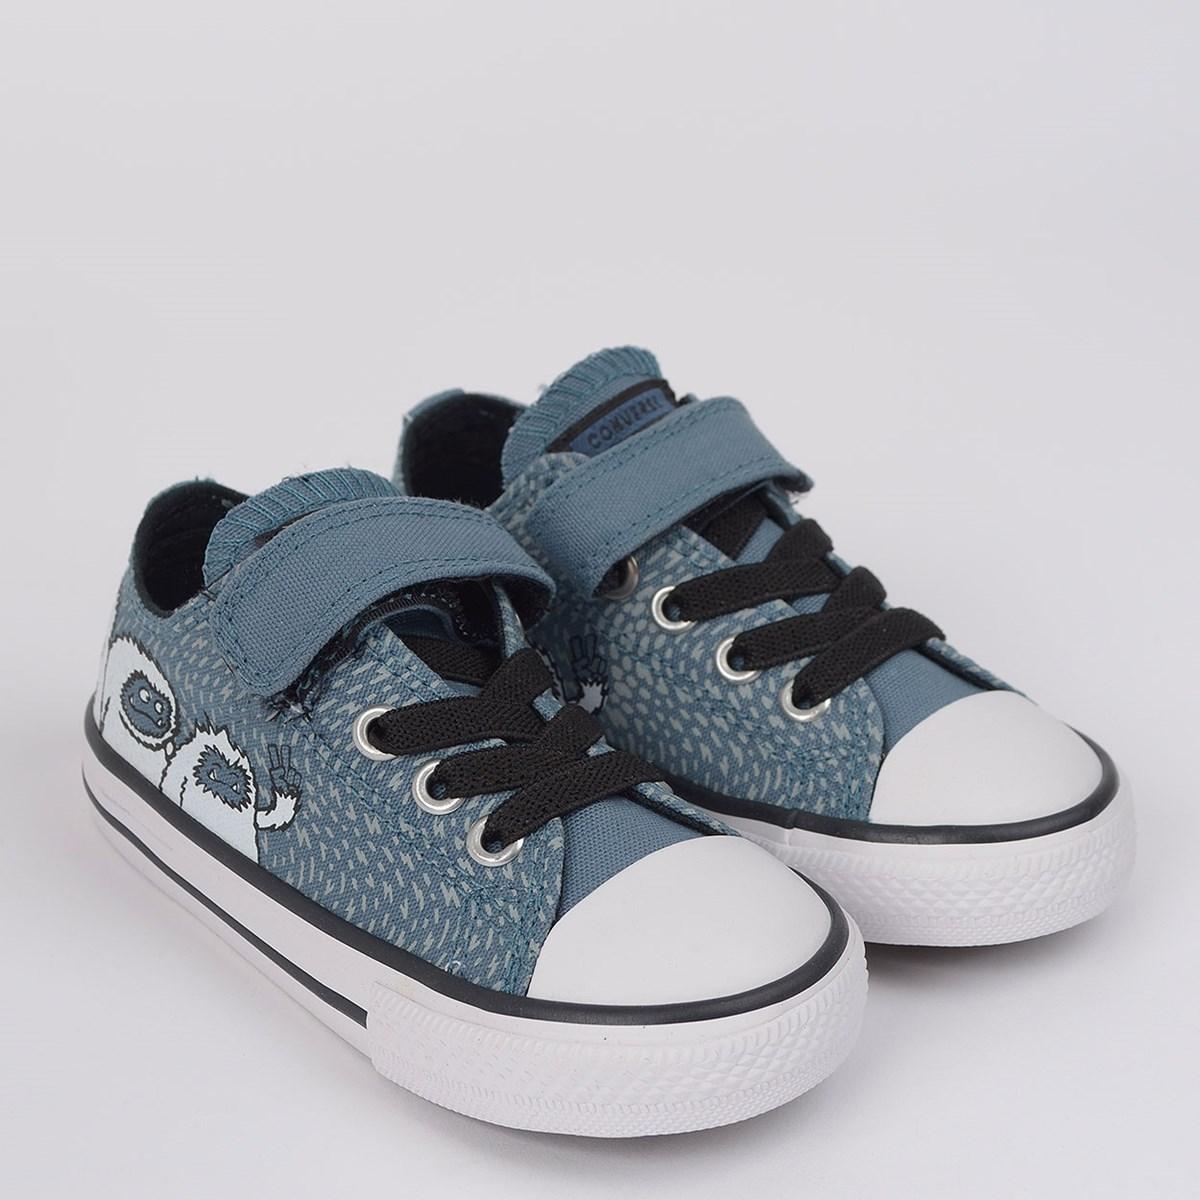 Tênis Converse Chuck Taylor All Star 1V Kids Lago Azul Branco CK08920001